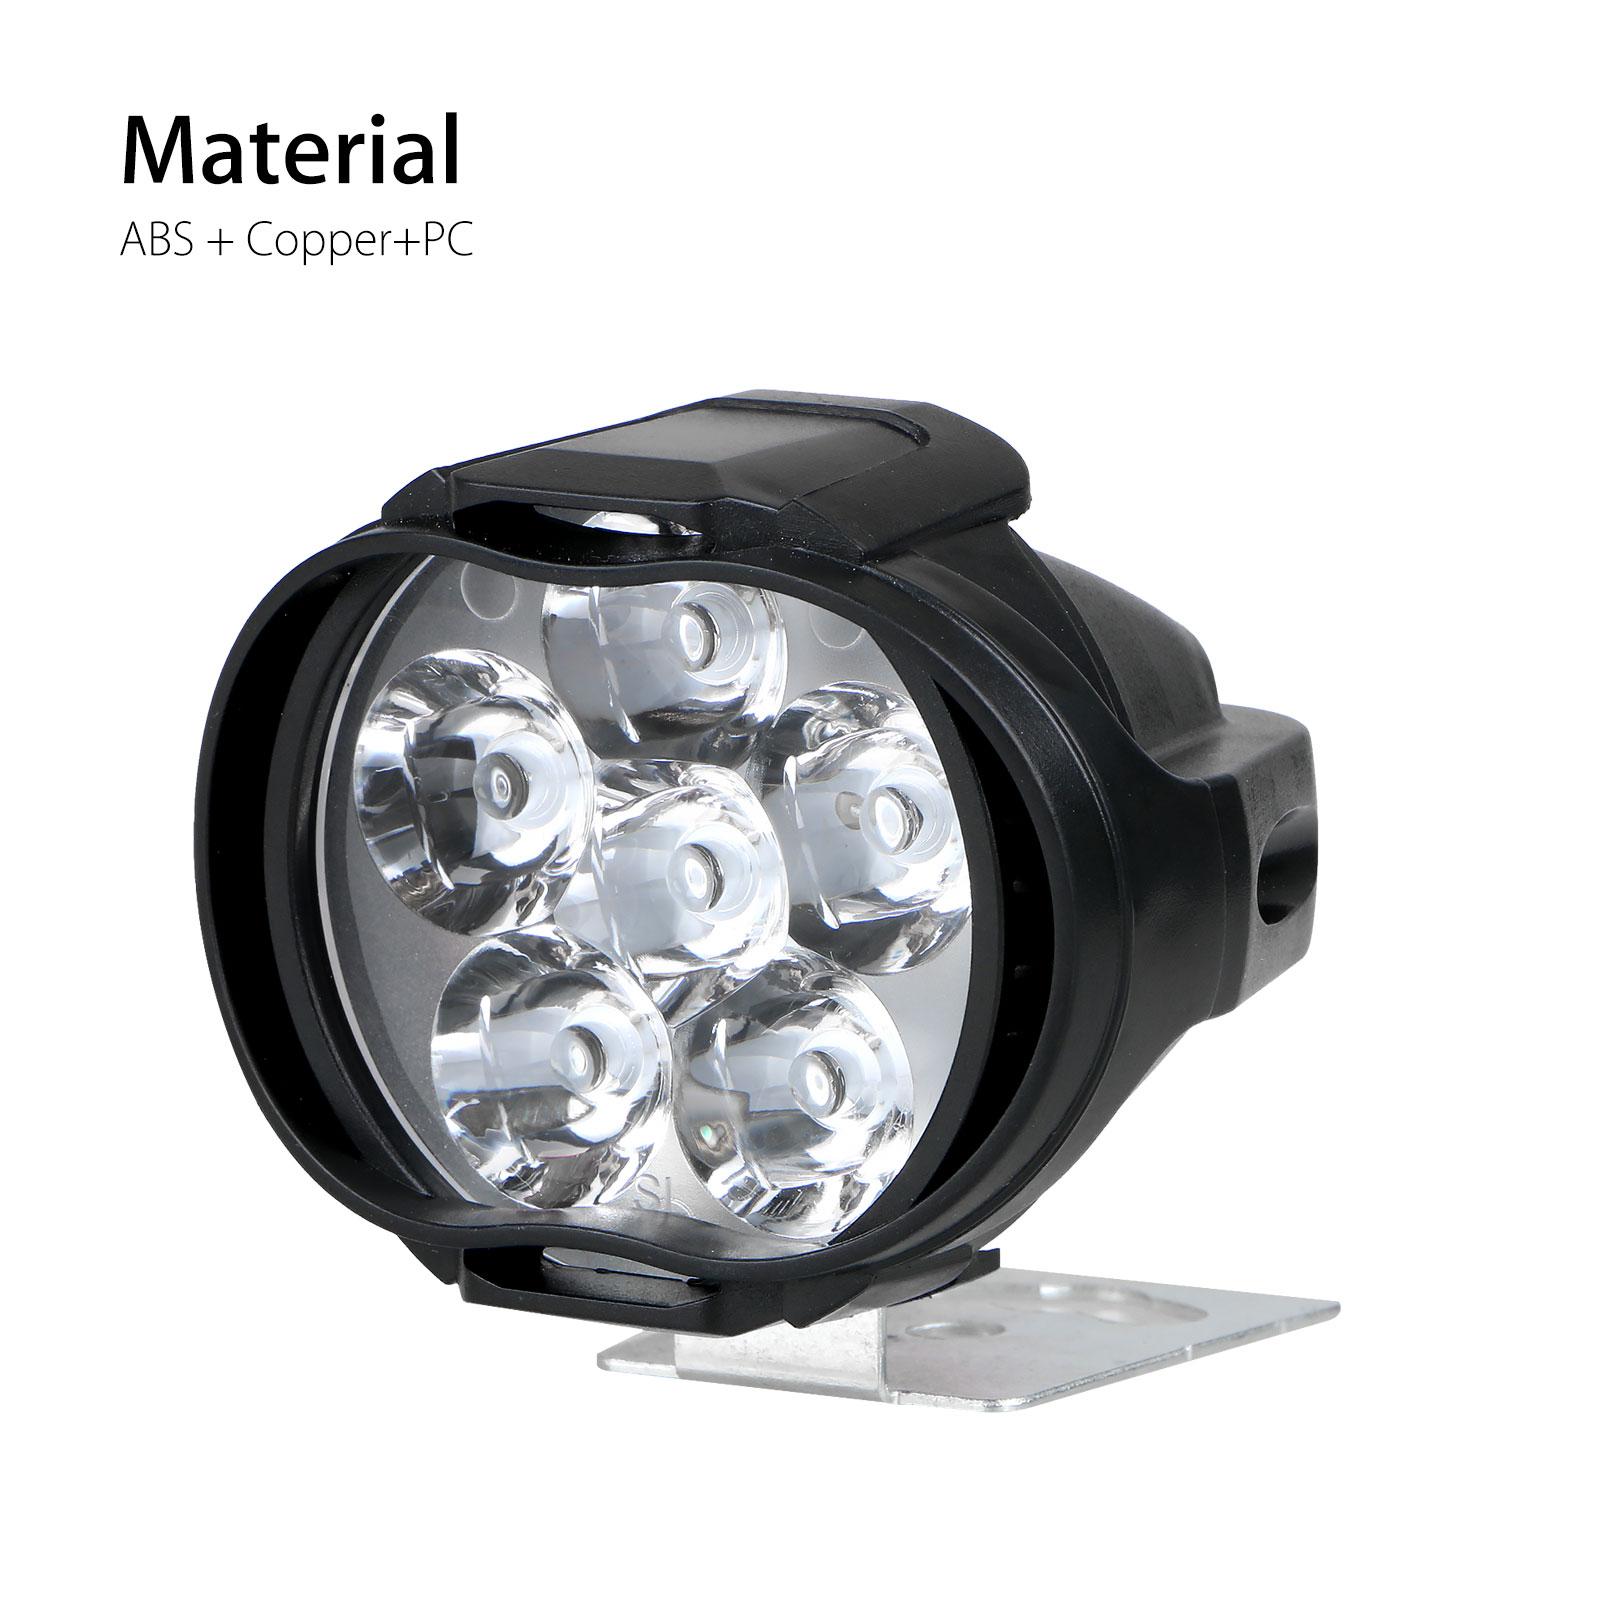 2Pcs-Universal-Car-SUV-Motorcycle-LED-Waterproof-Lights-Fog-Light-Headlight-Lamp thumbnail 2